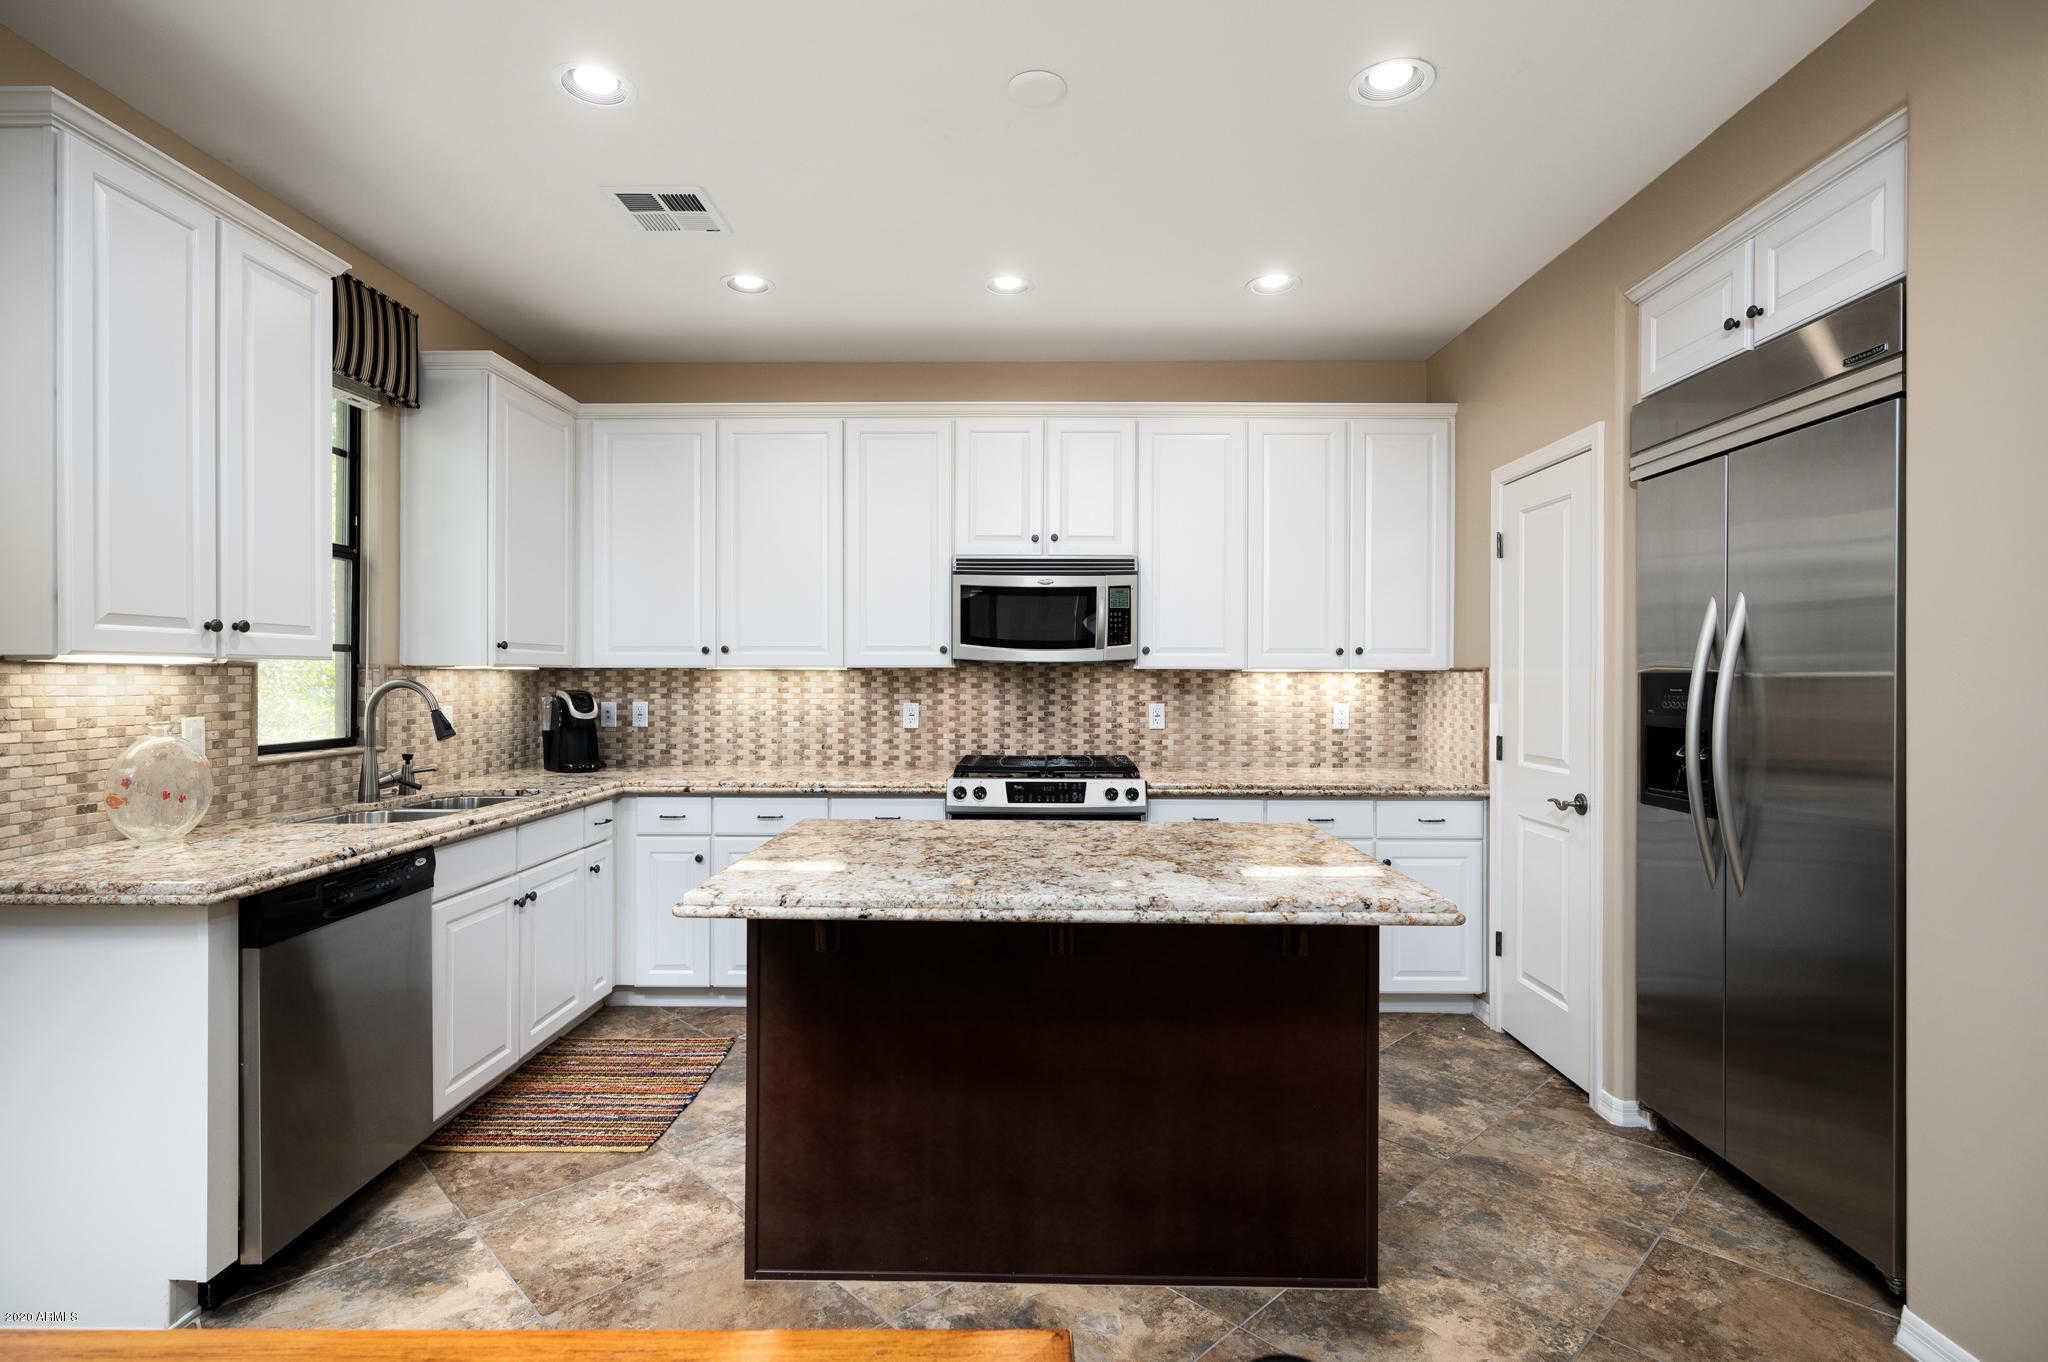 $469,000 - 2Br/2Ba -  for Sale in Courtyards At Desert Park Condominium- Dc Ranch, Scottsdale